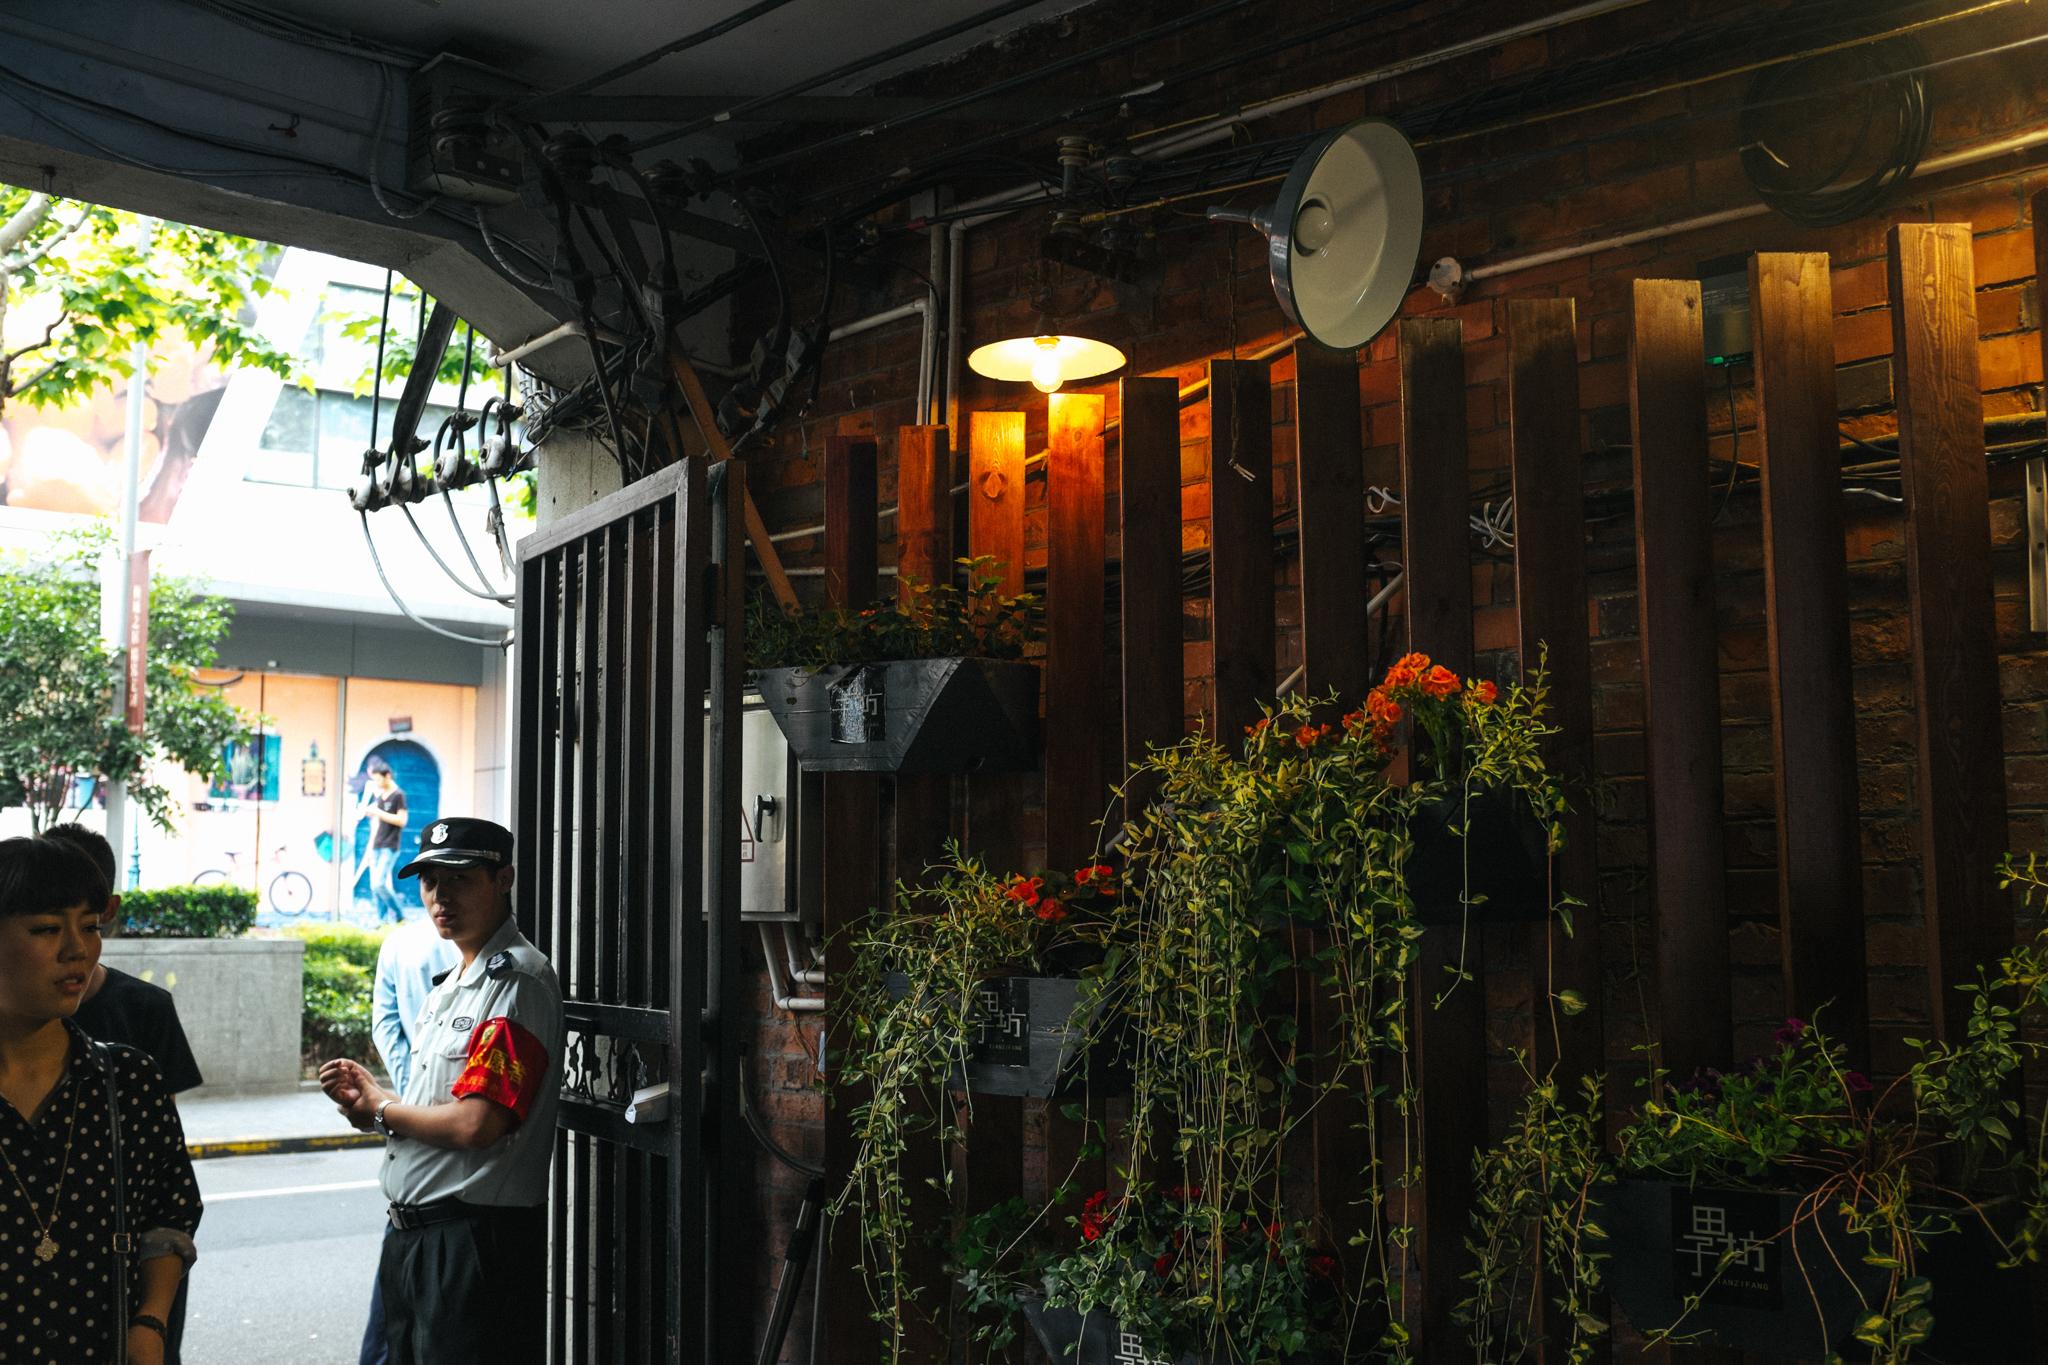 20150610155246_Shanghai_Copyright_EjunLow_X100S_0088.jpg